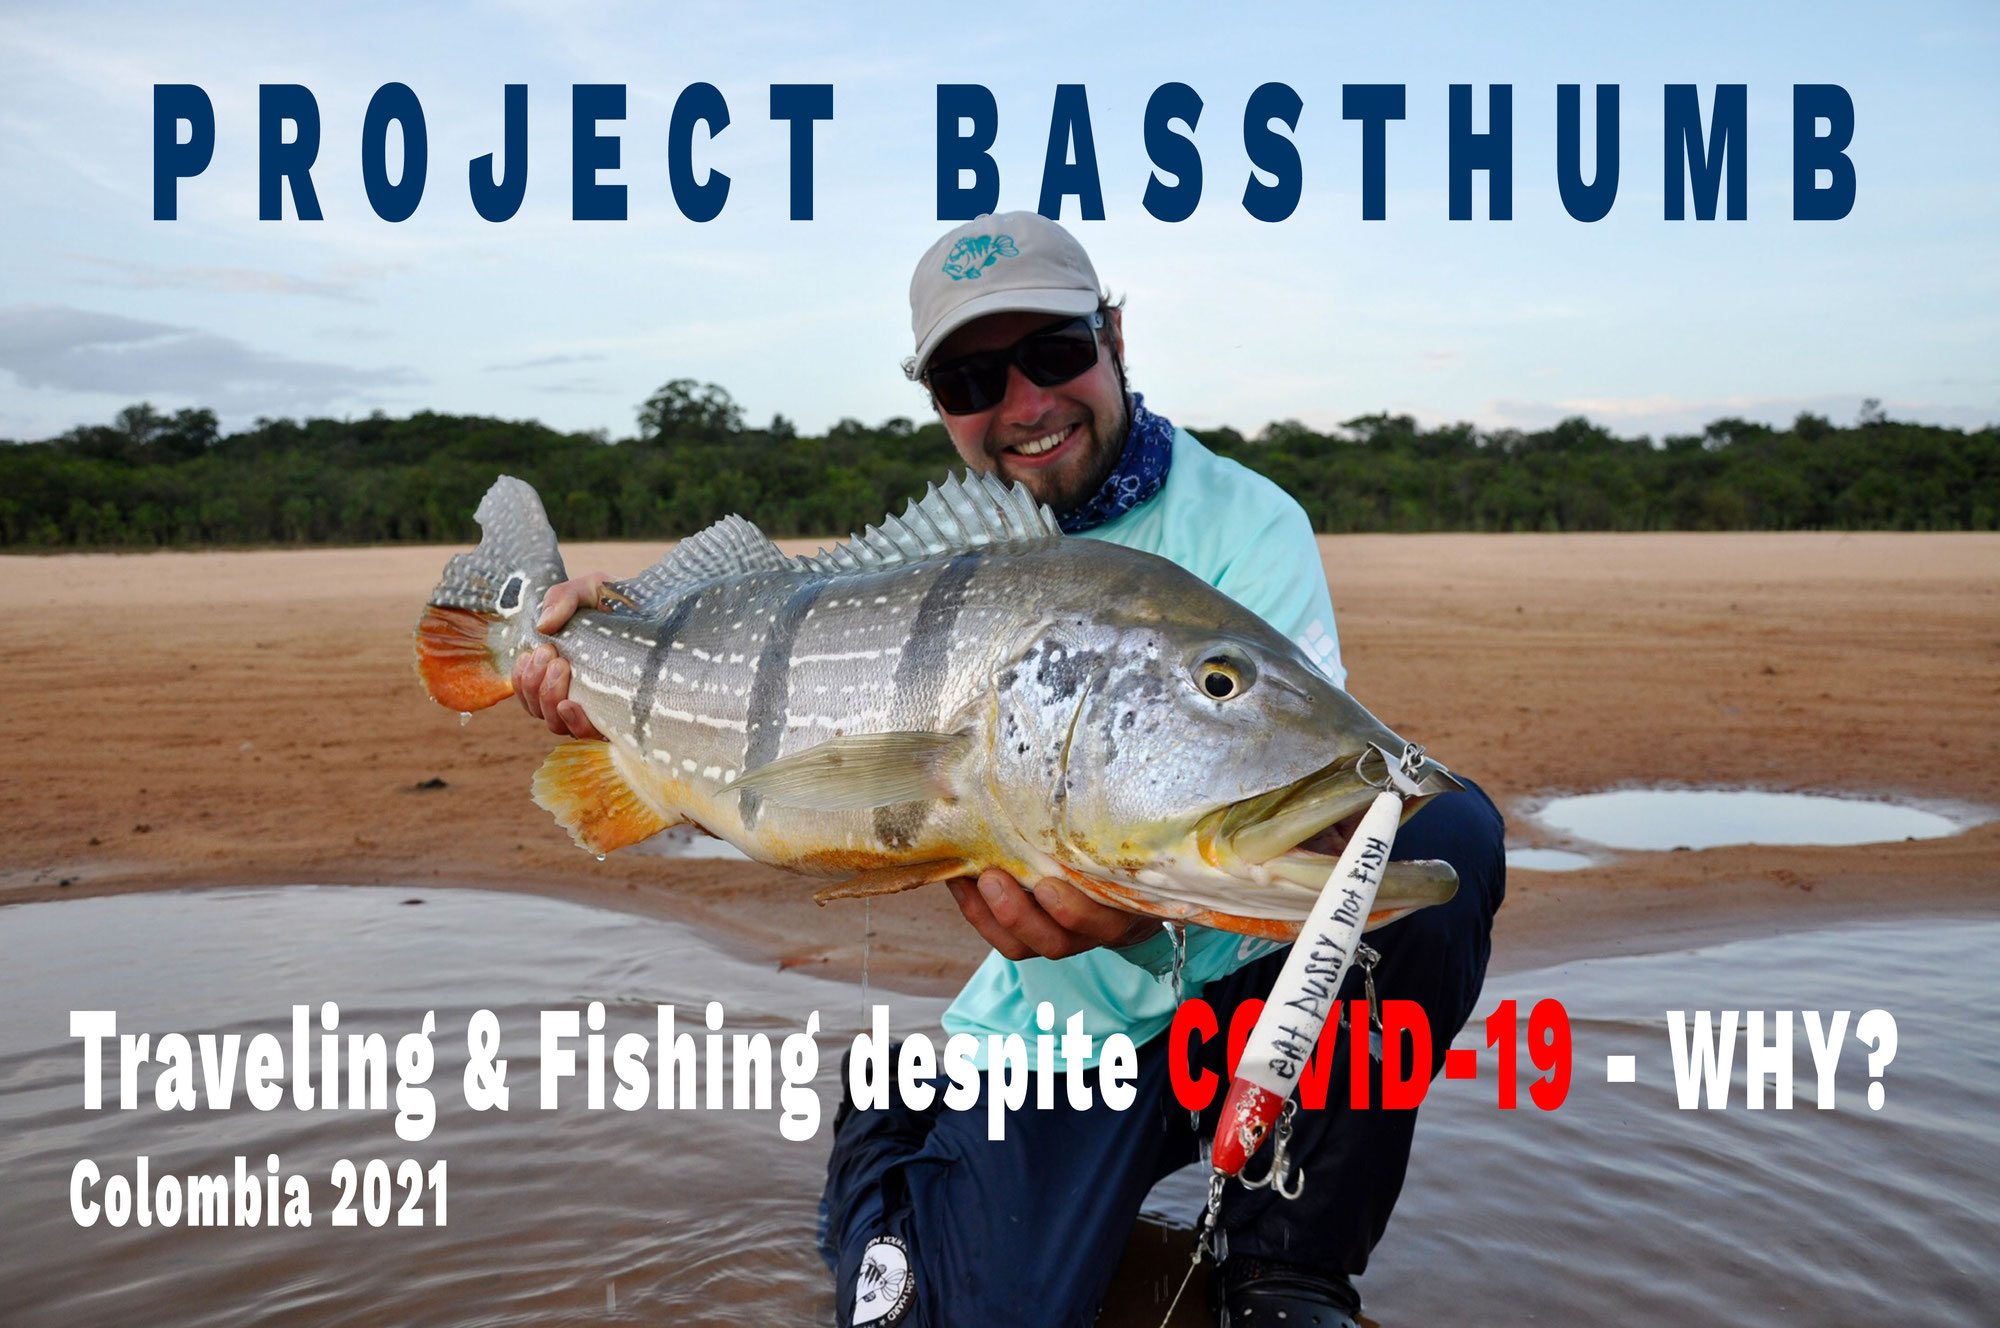 Traveling & fishing despite COVID-19 - Colombia 2021